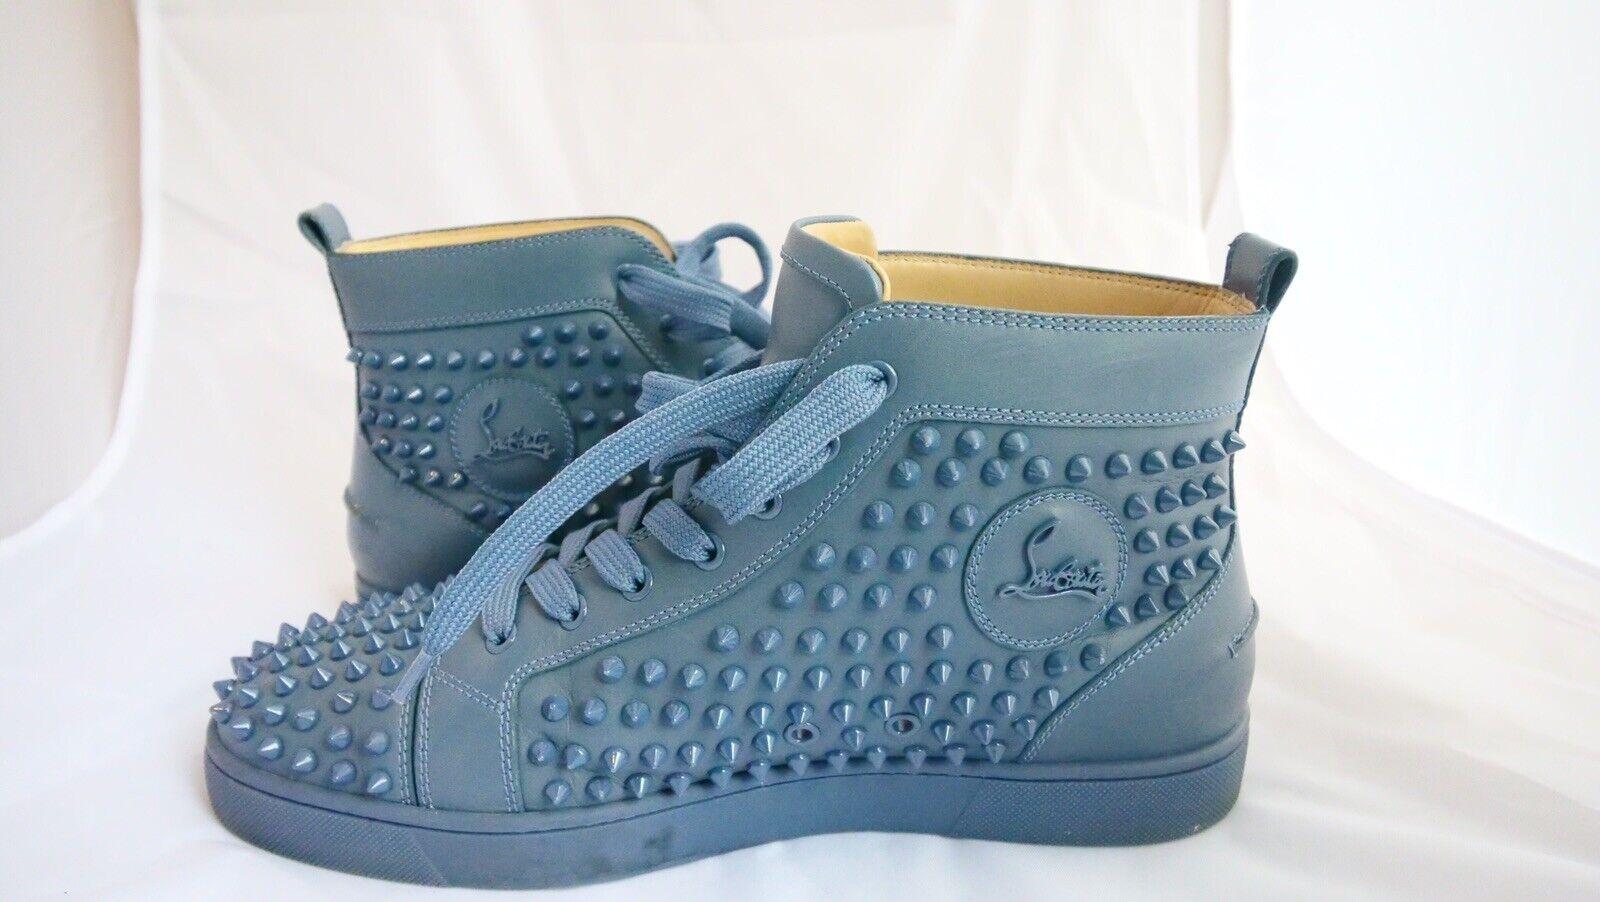 low priced 02c4a 12adb Christian Louboutin Men's Shoes 44